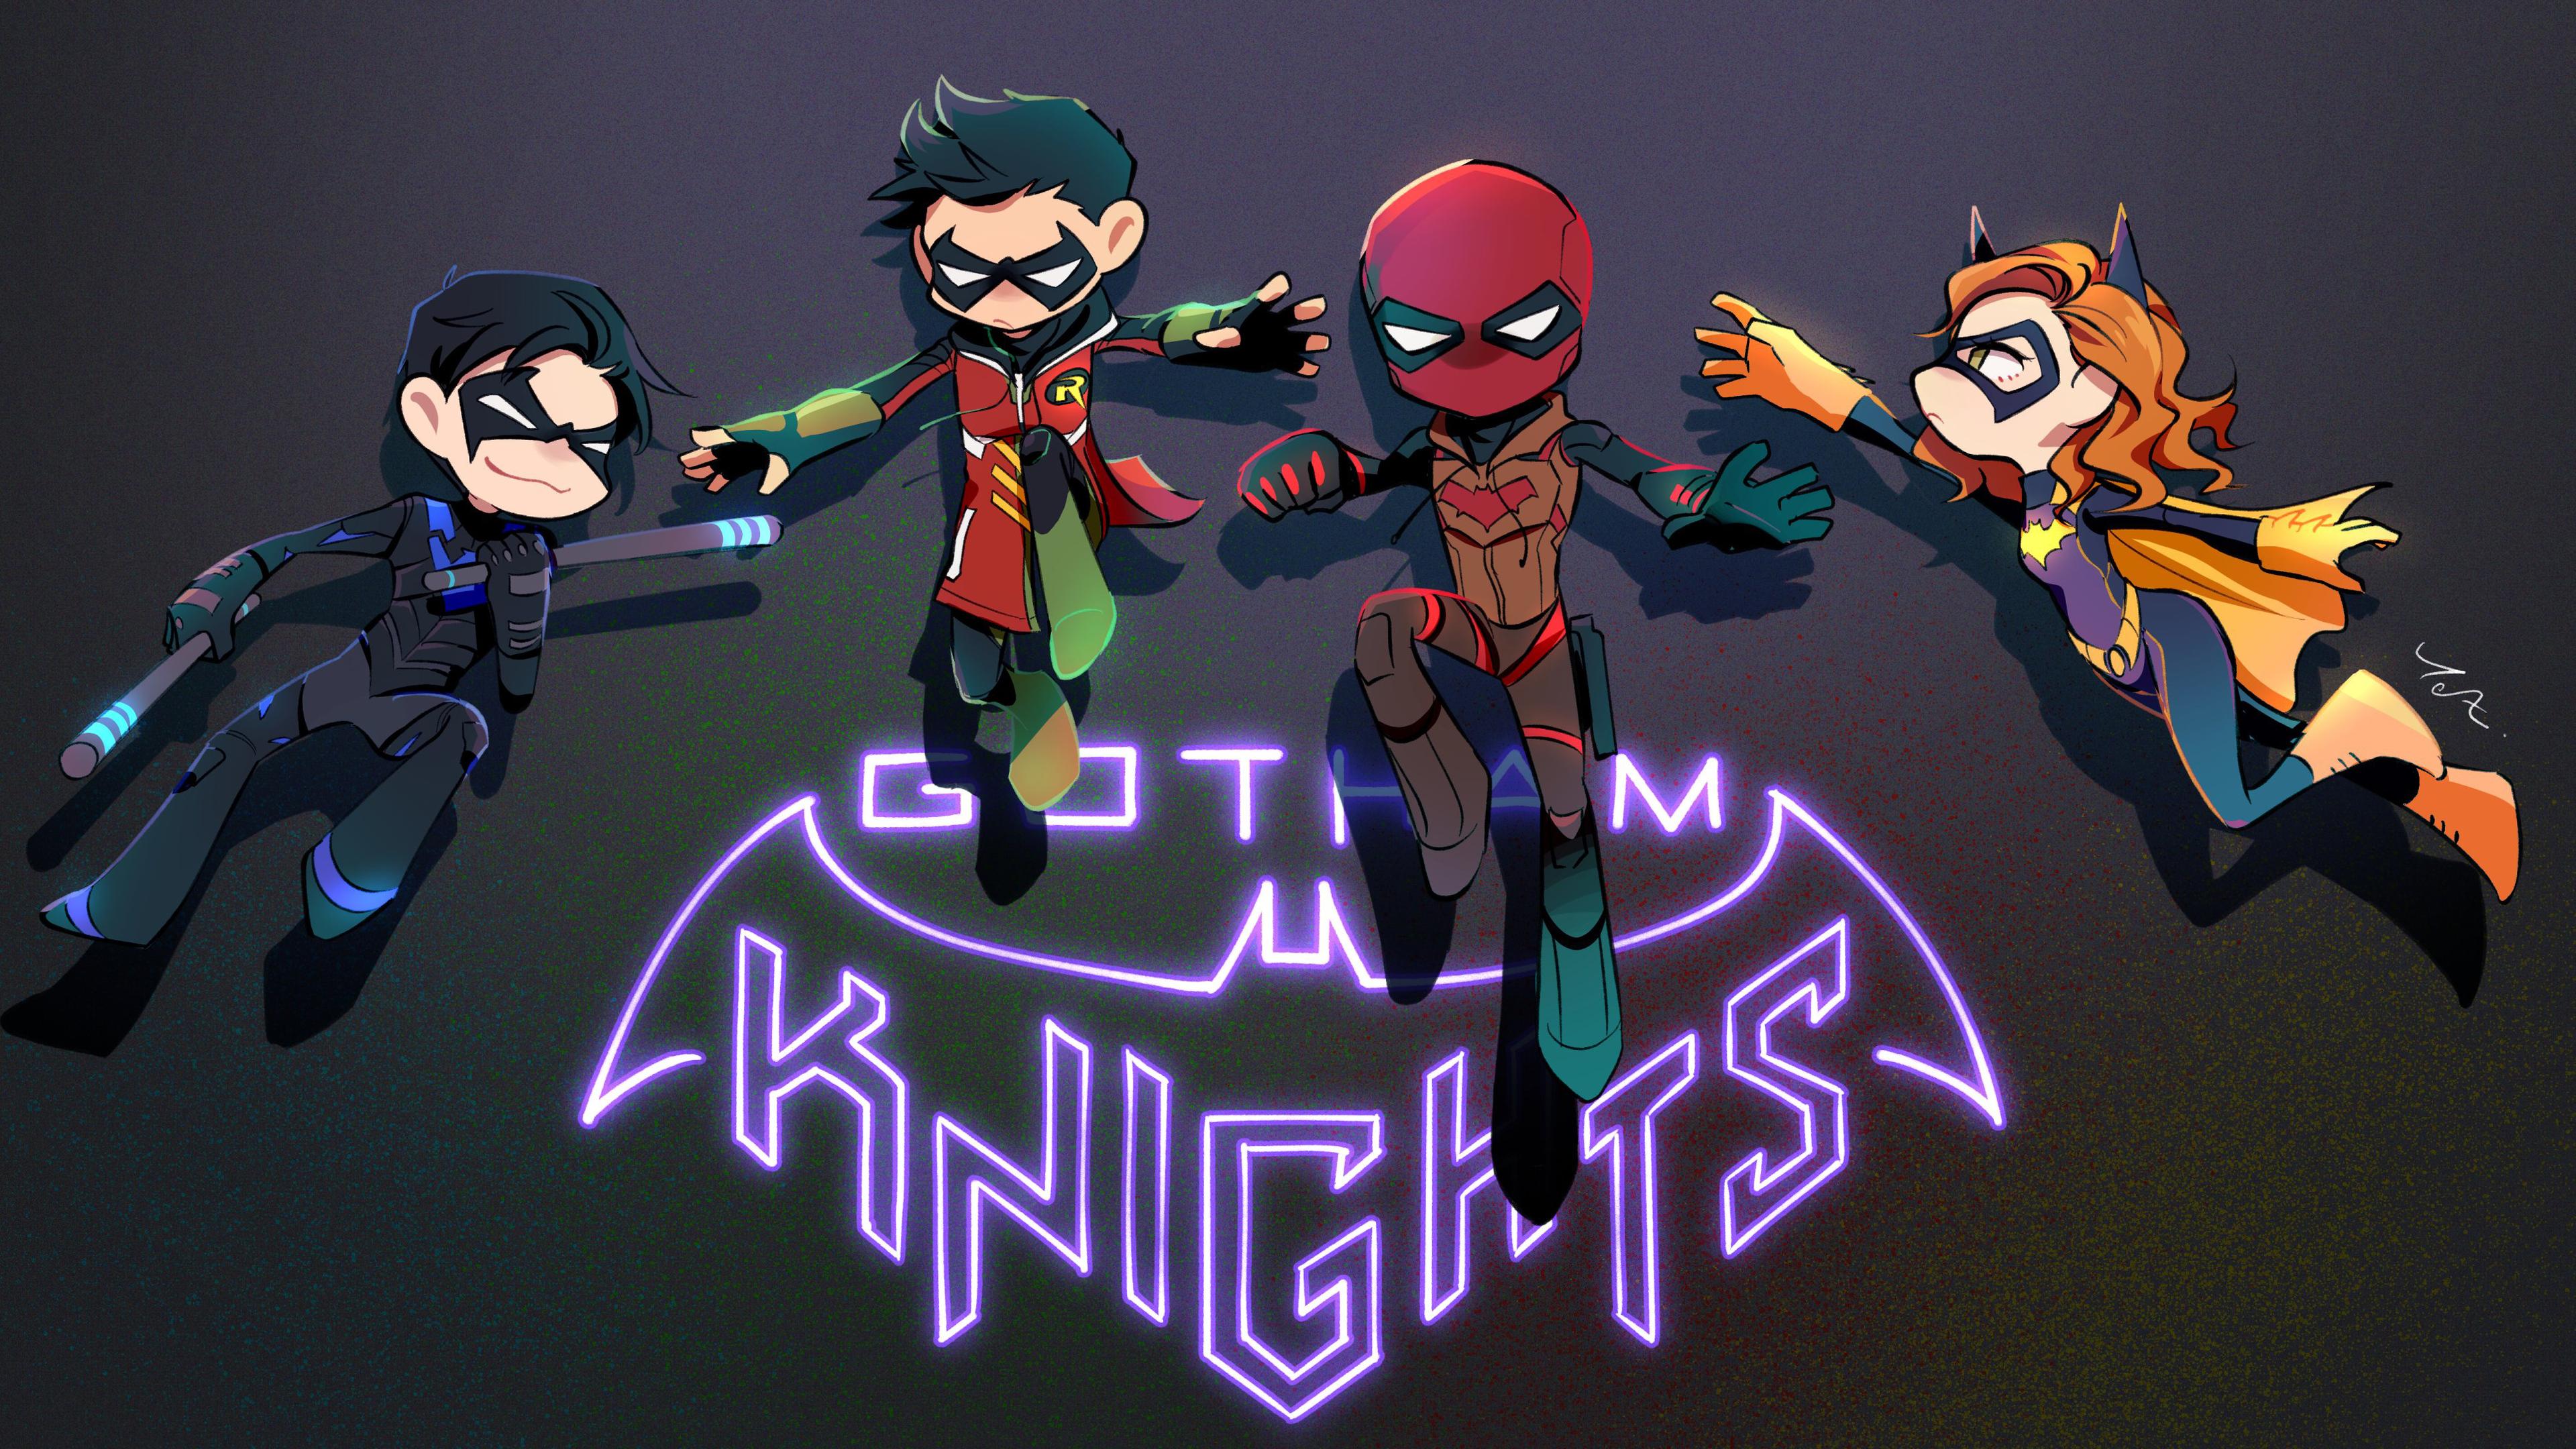 gotham-knights-superheroes-4k-y0.jpg